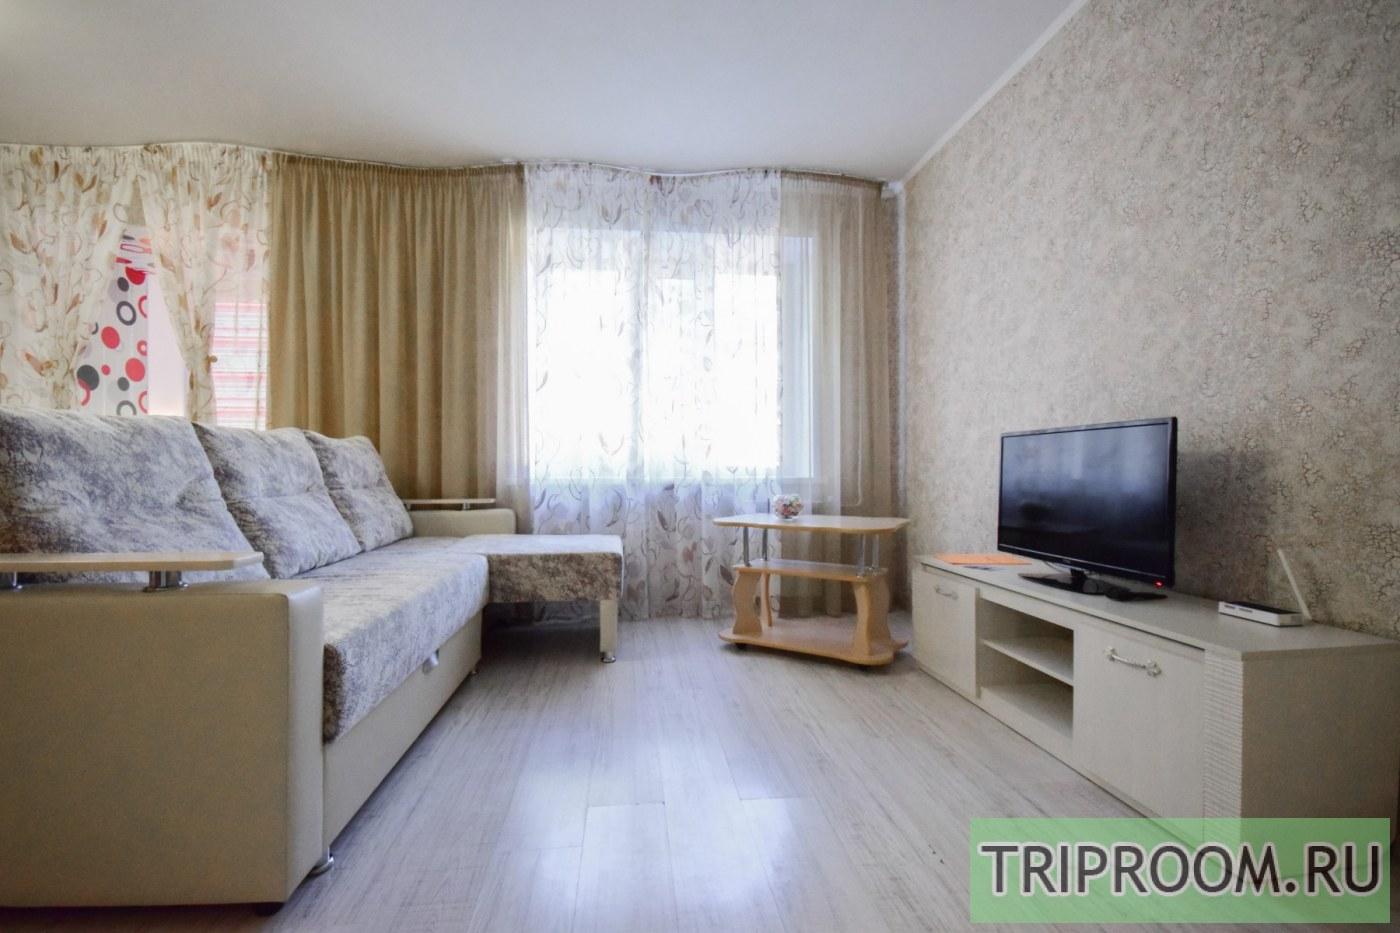 1-комнатная квартира посуточно (вариант № 36547), ул. Тихий переулок, фото № 3